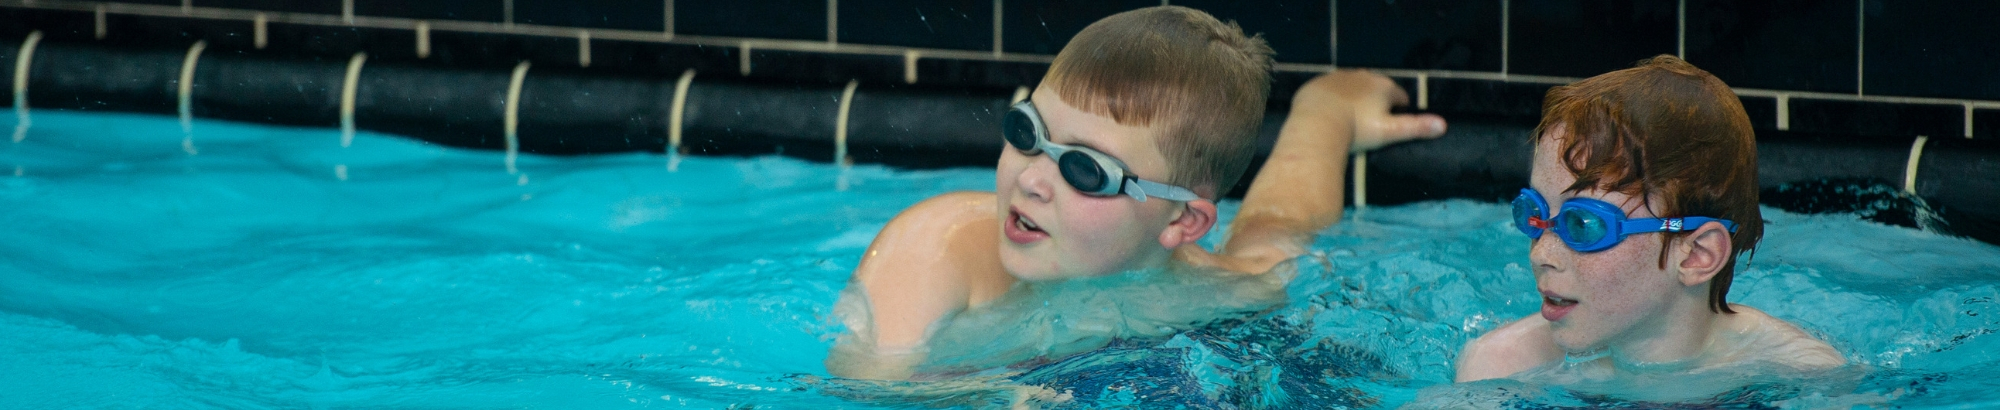 2000x410 jb school swim2